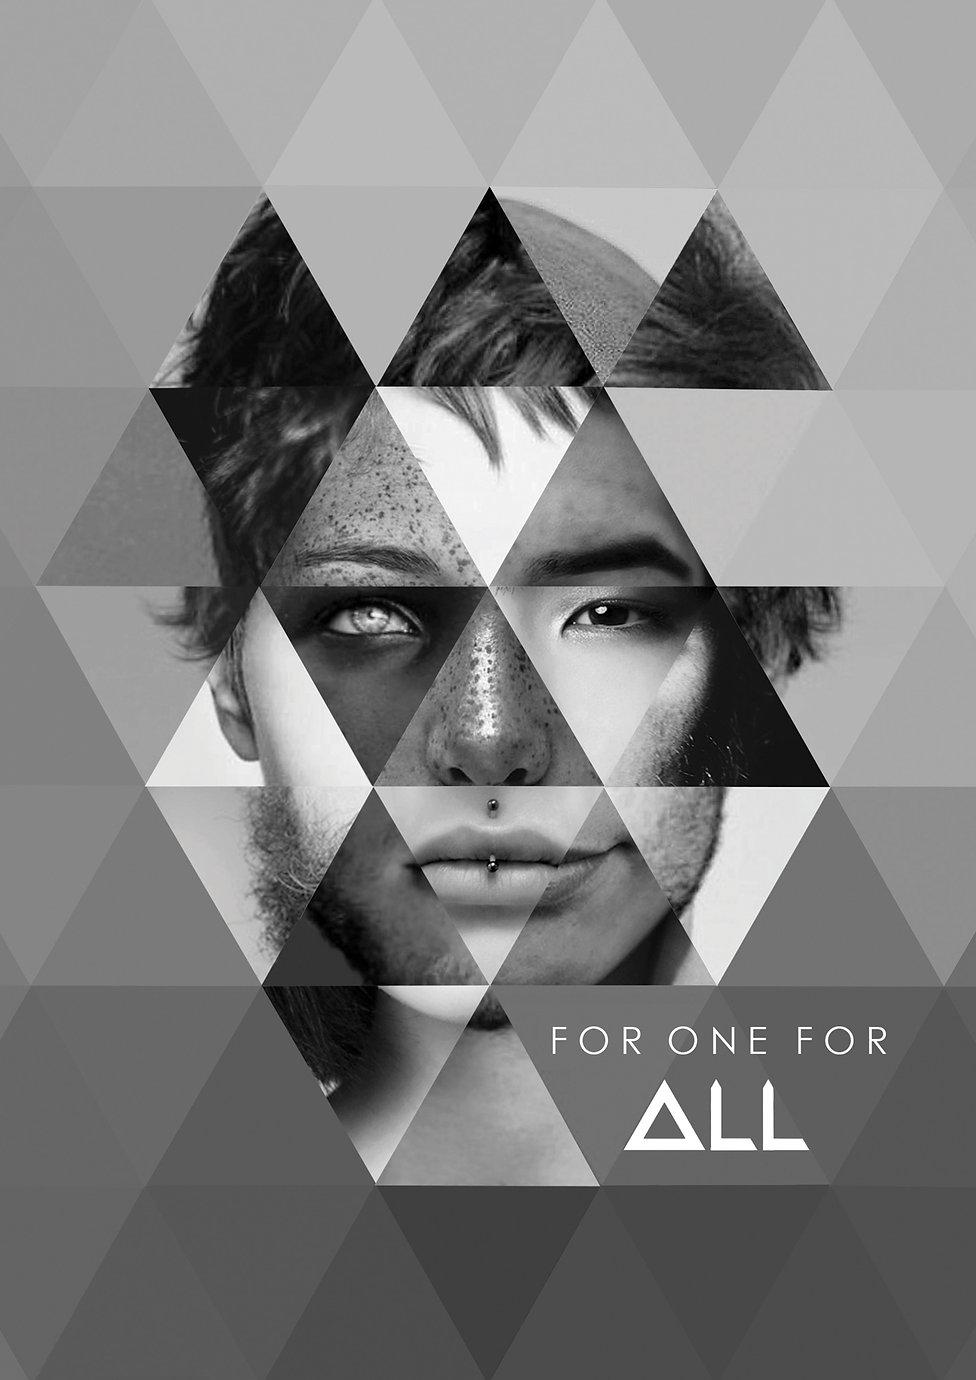 all-faces-web-min.jpg